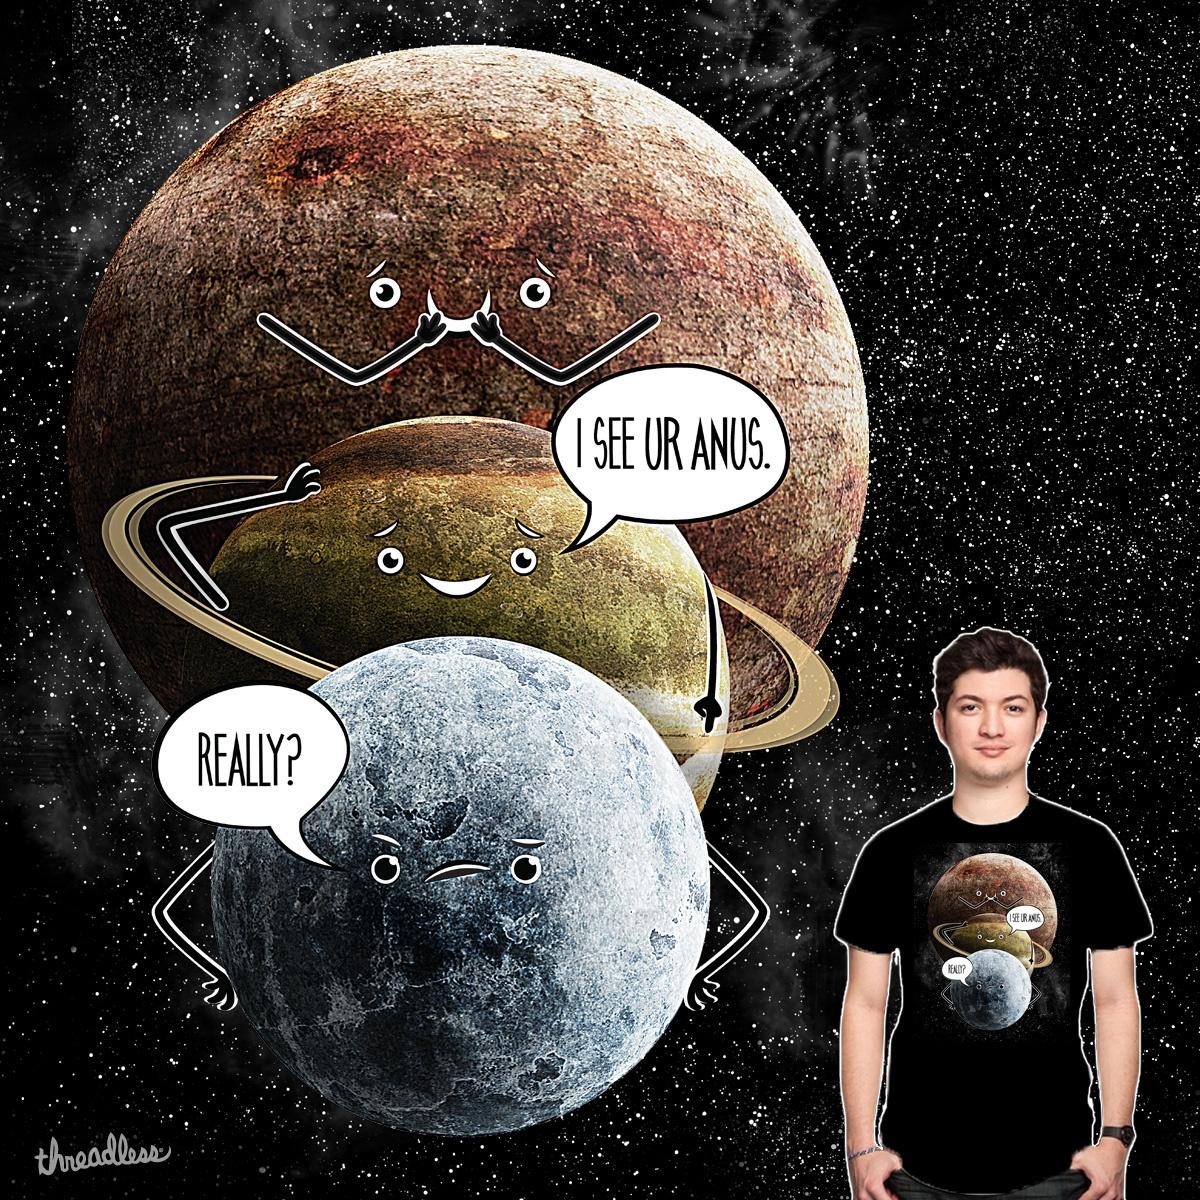 Planetary Immaturity by PolySciGuy on Threadless